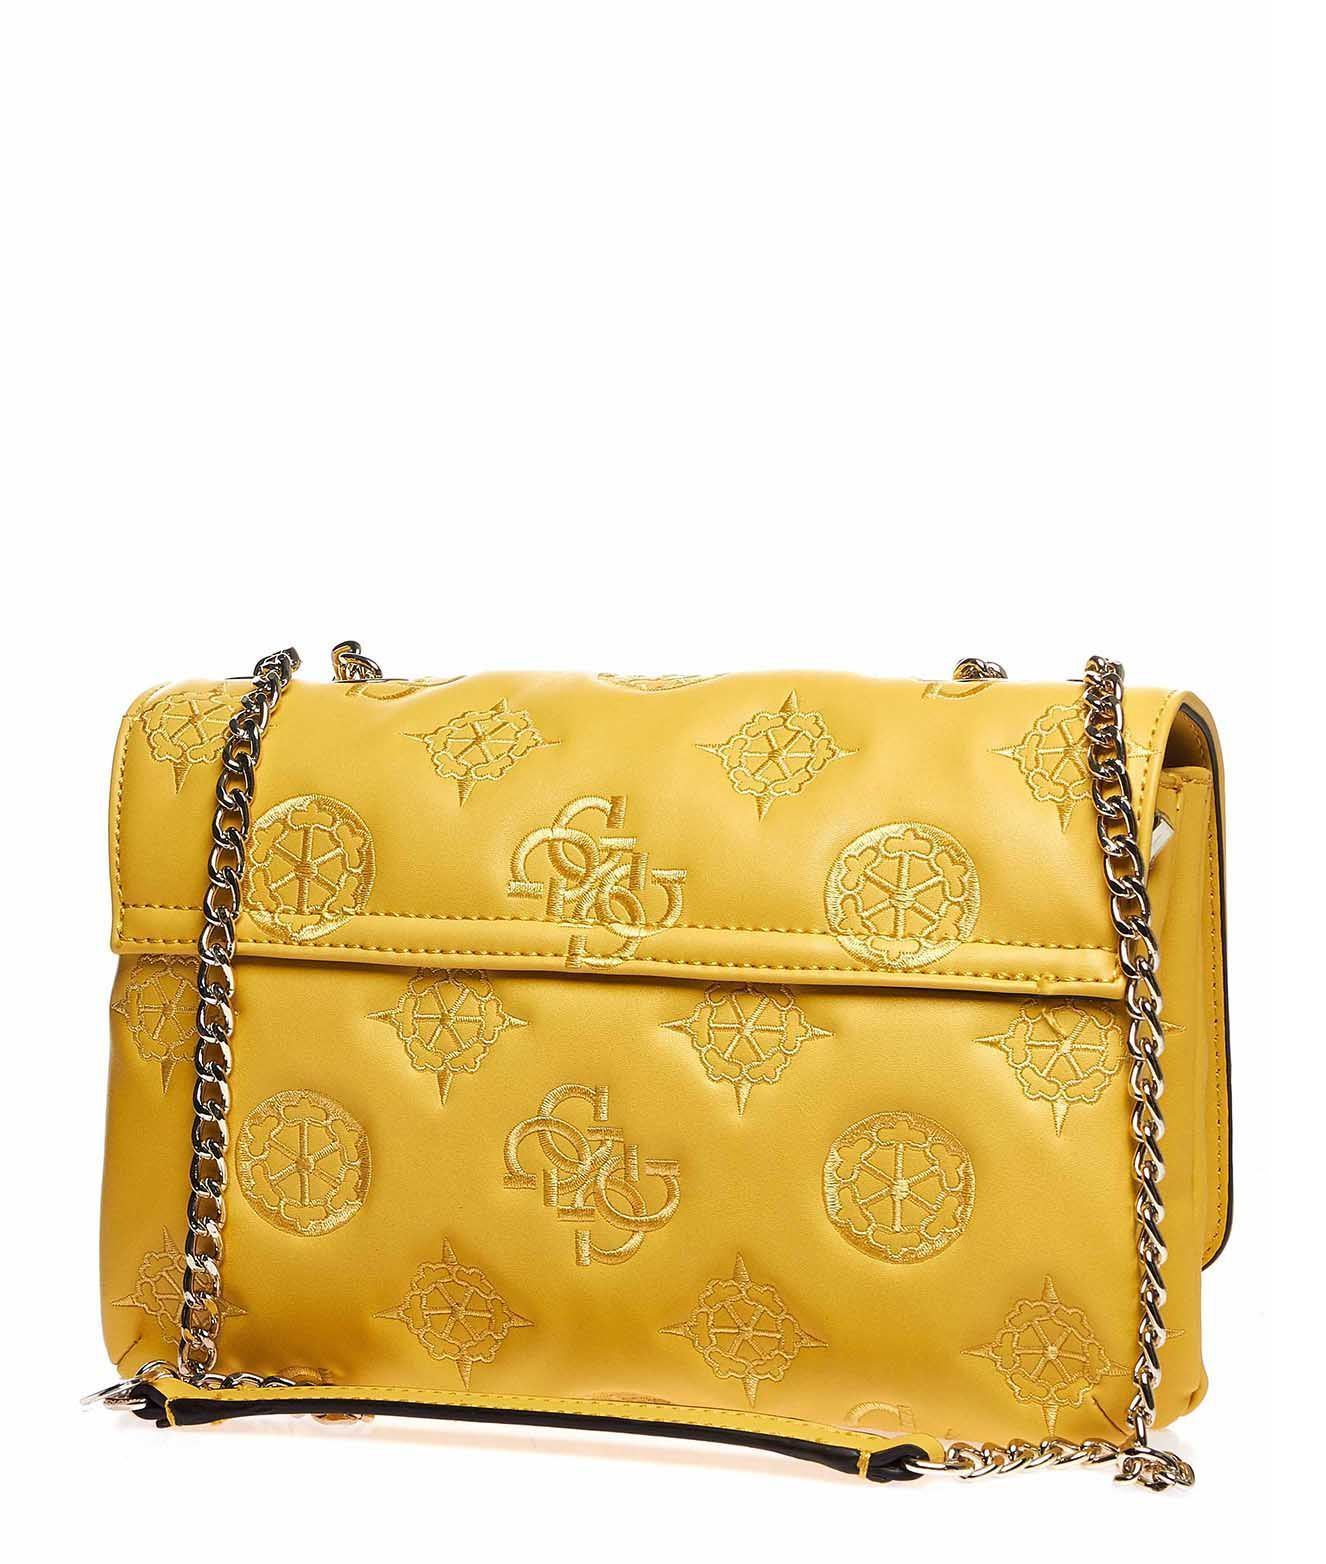 GUESS WOMEN'S HWSG7589210YELLOW YELLOW POLYURETHANE SHOULDER BAG